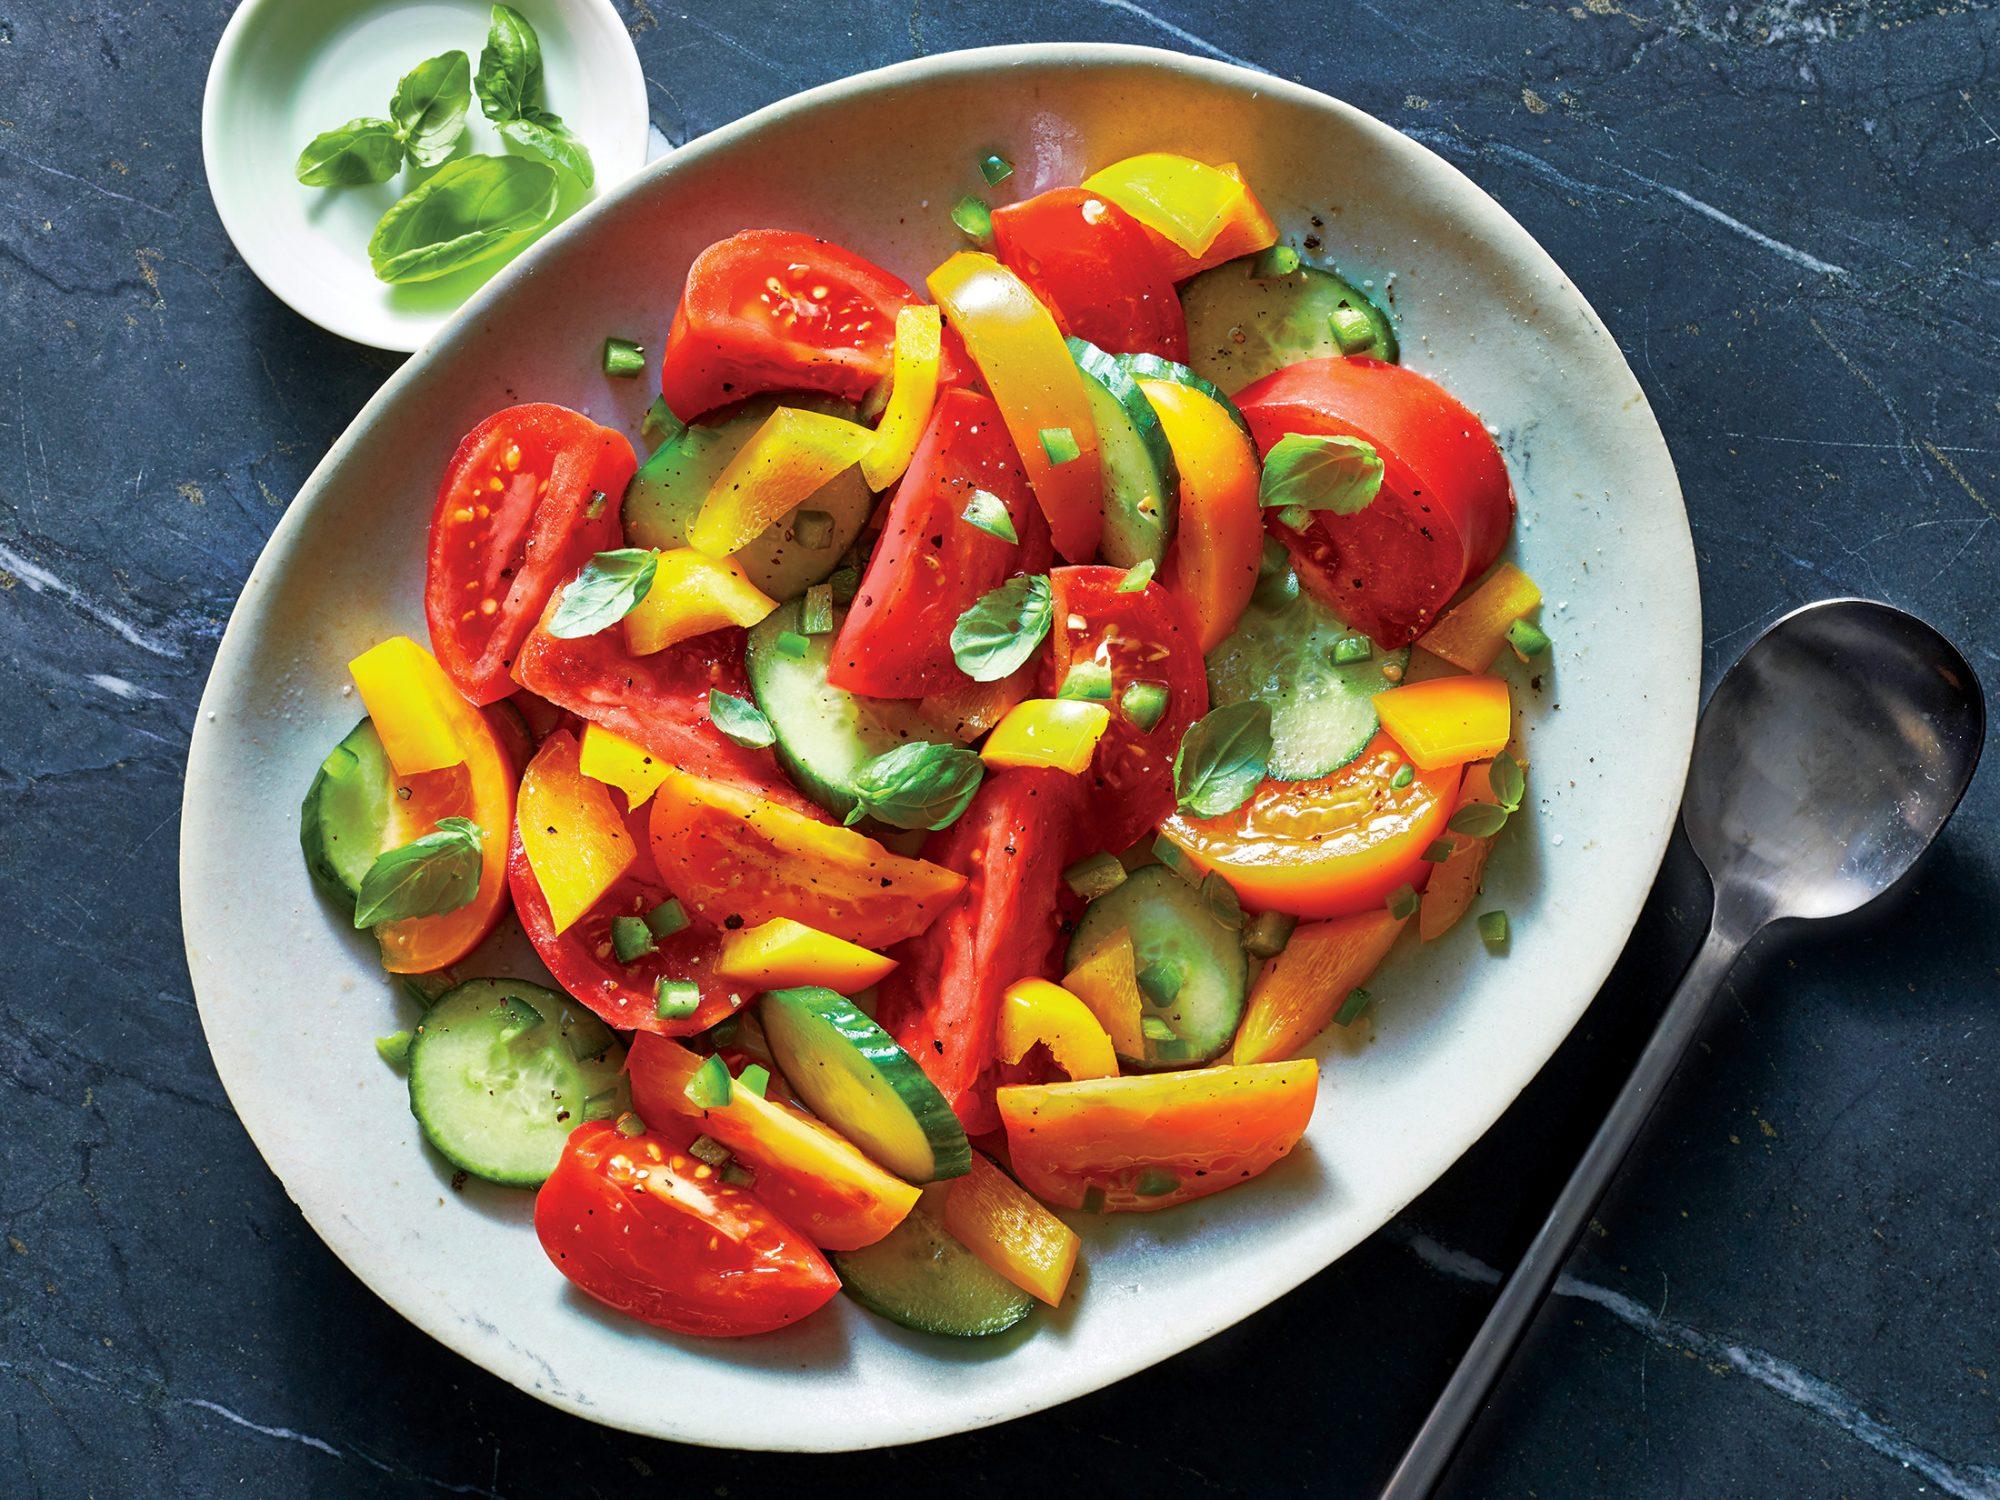 Spicy Tomato-Cucumber Salad